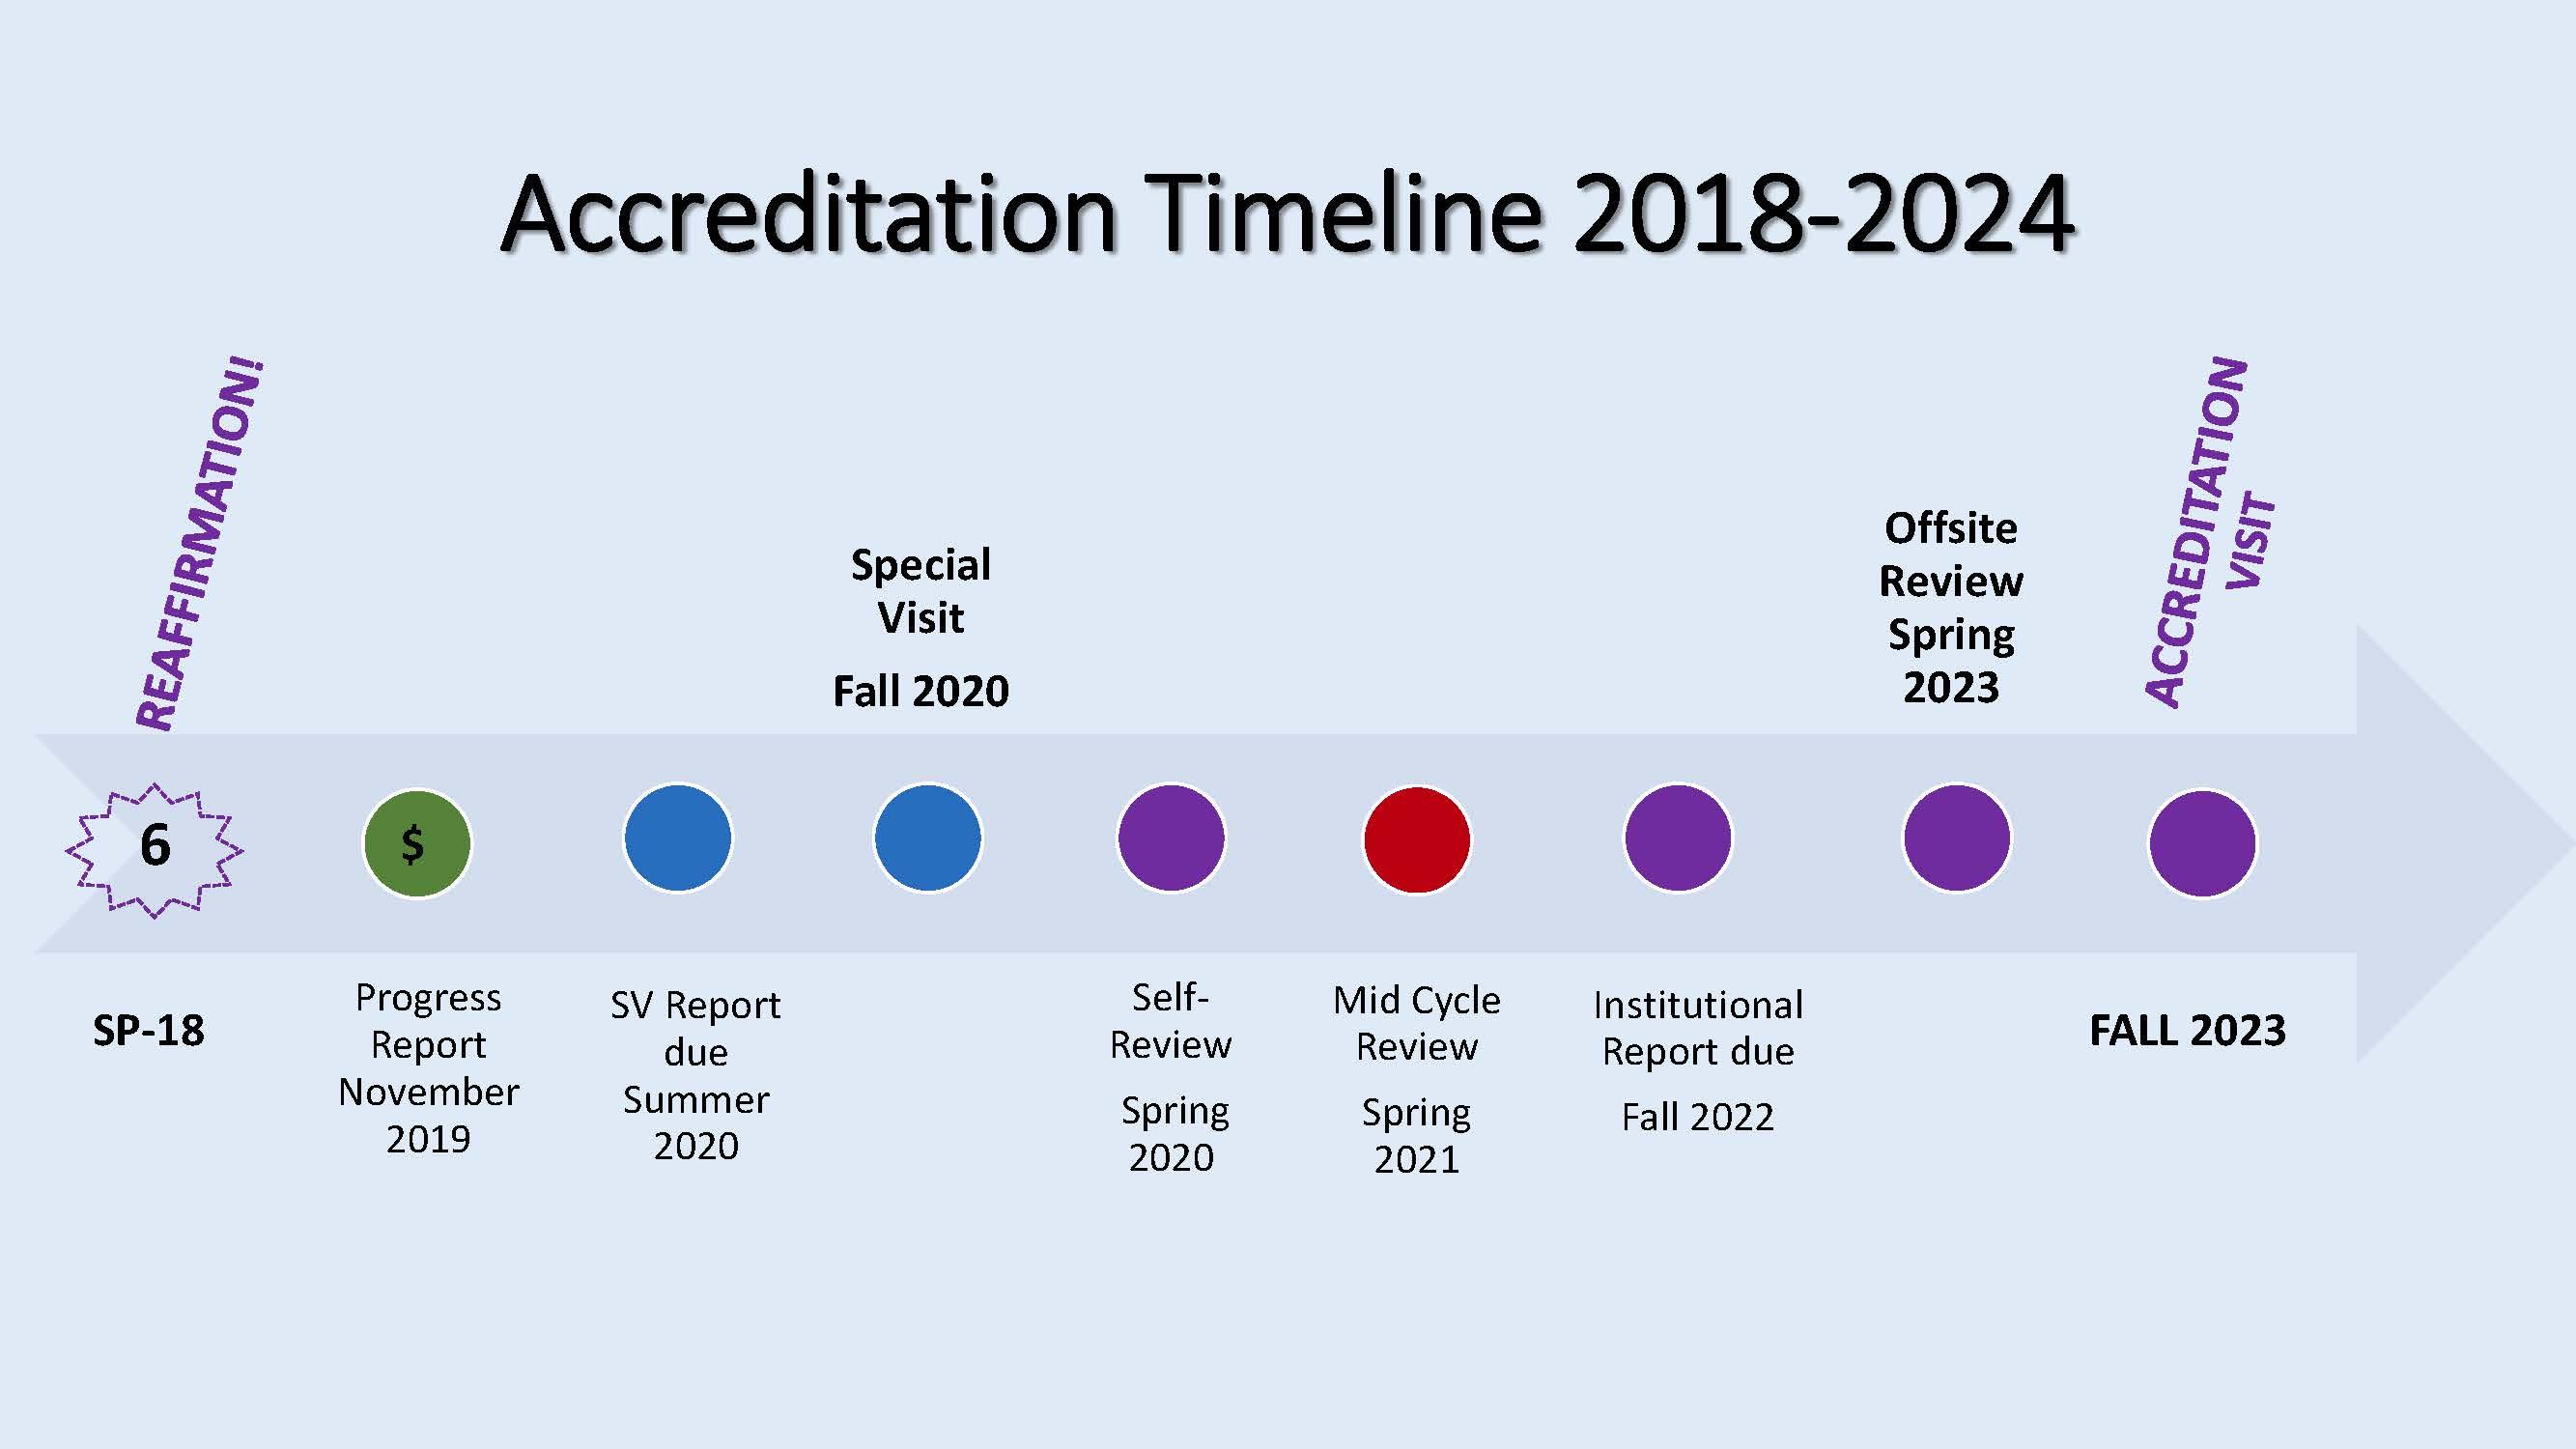 Accreditation Timeline 2018-2024